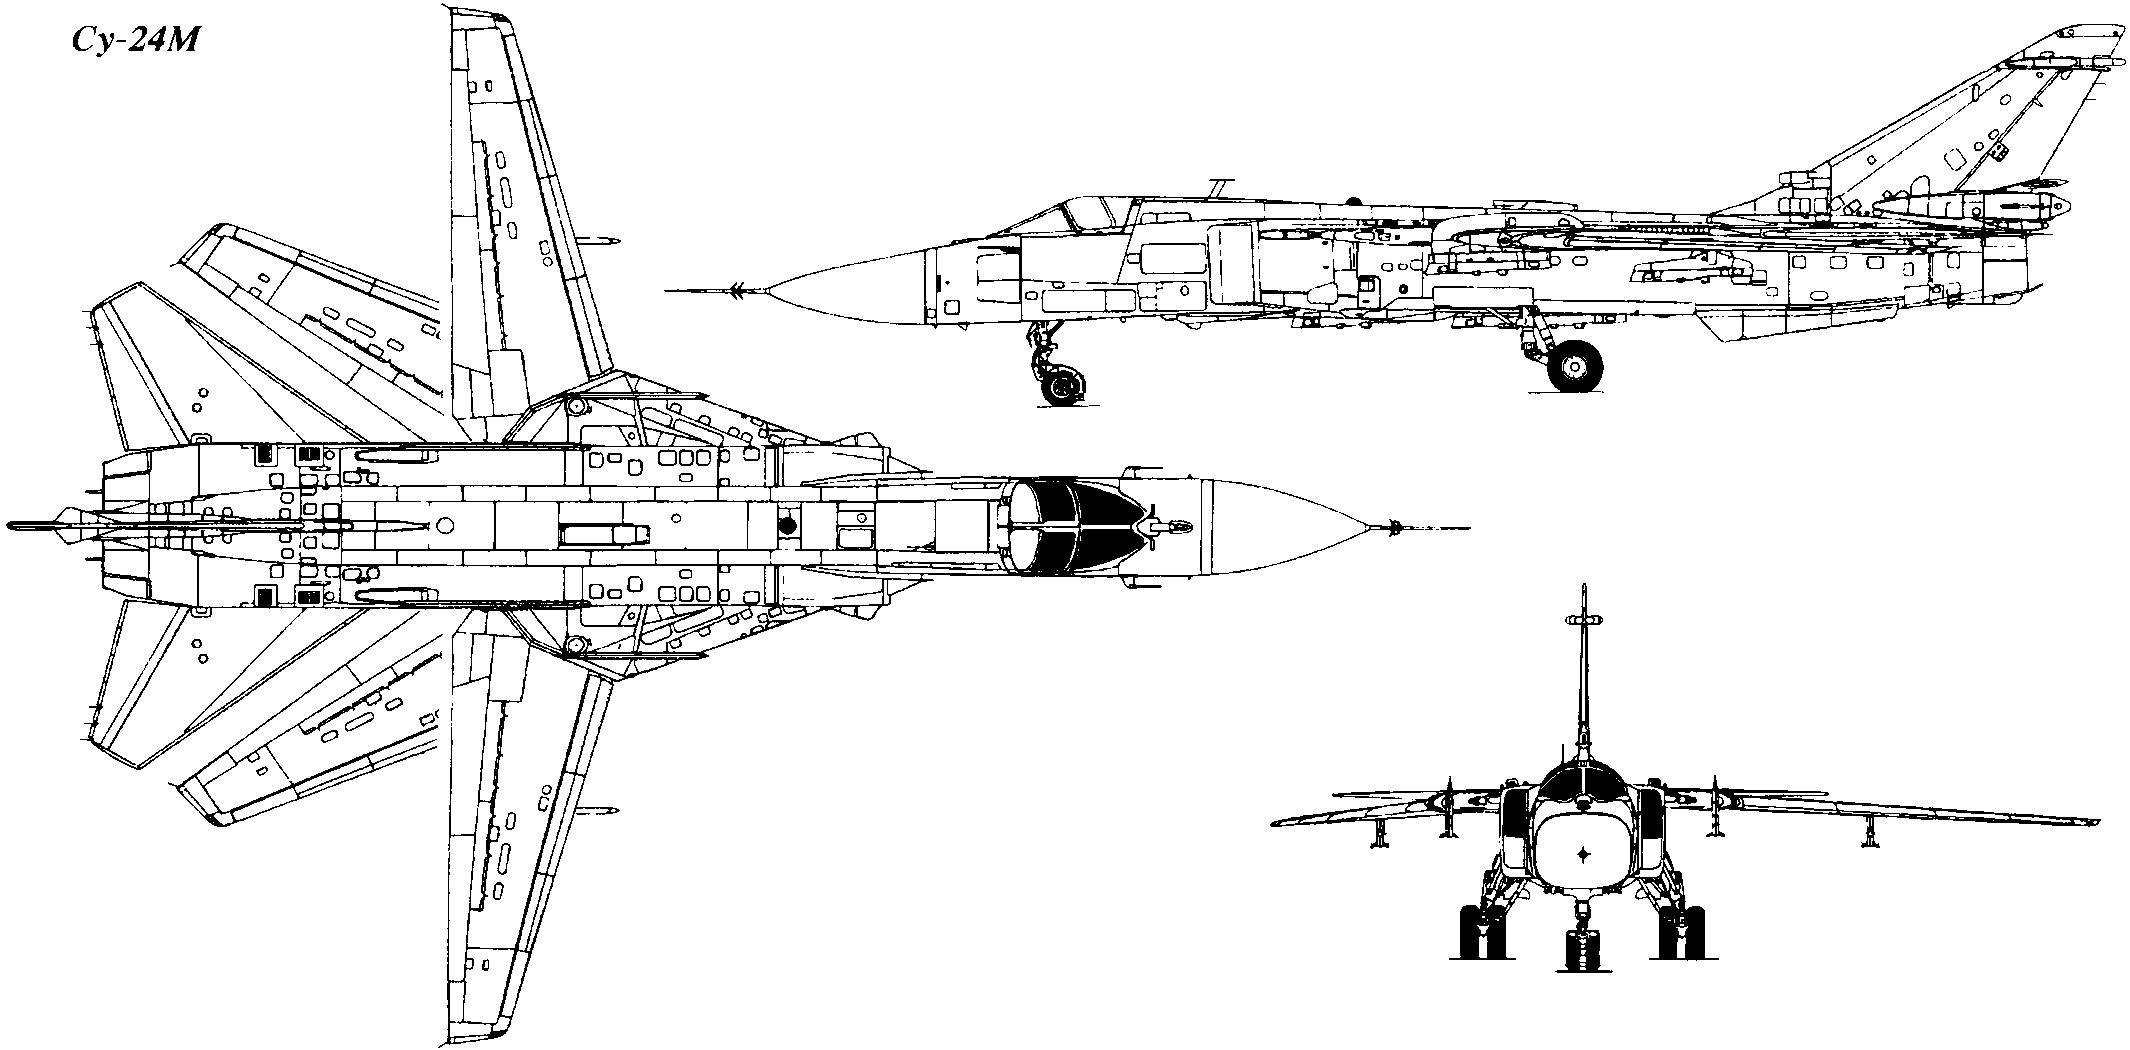 Проекции фронтового бомбардировщика Су-24М (http://aviadejavu.ru/)